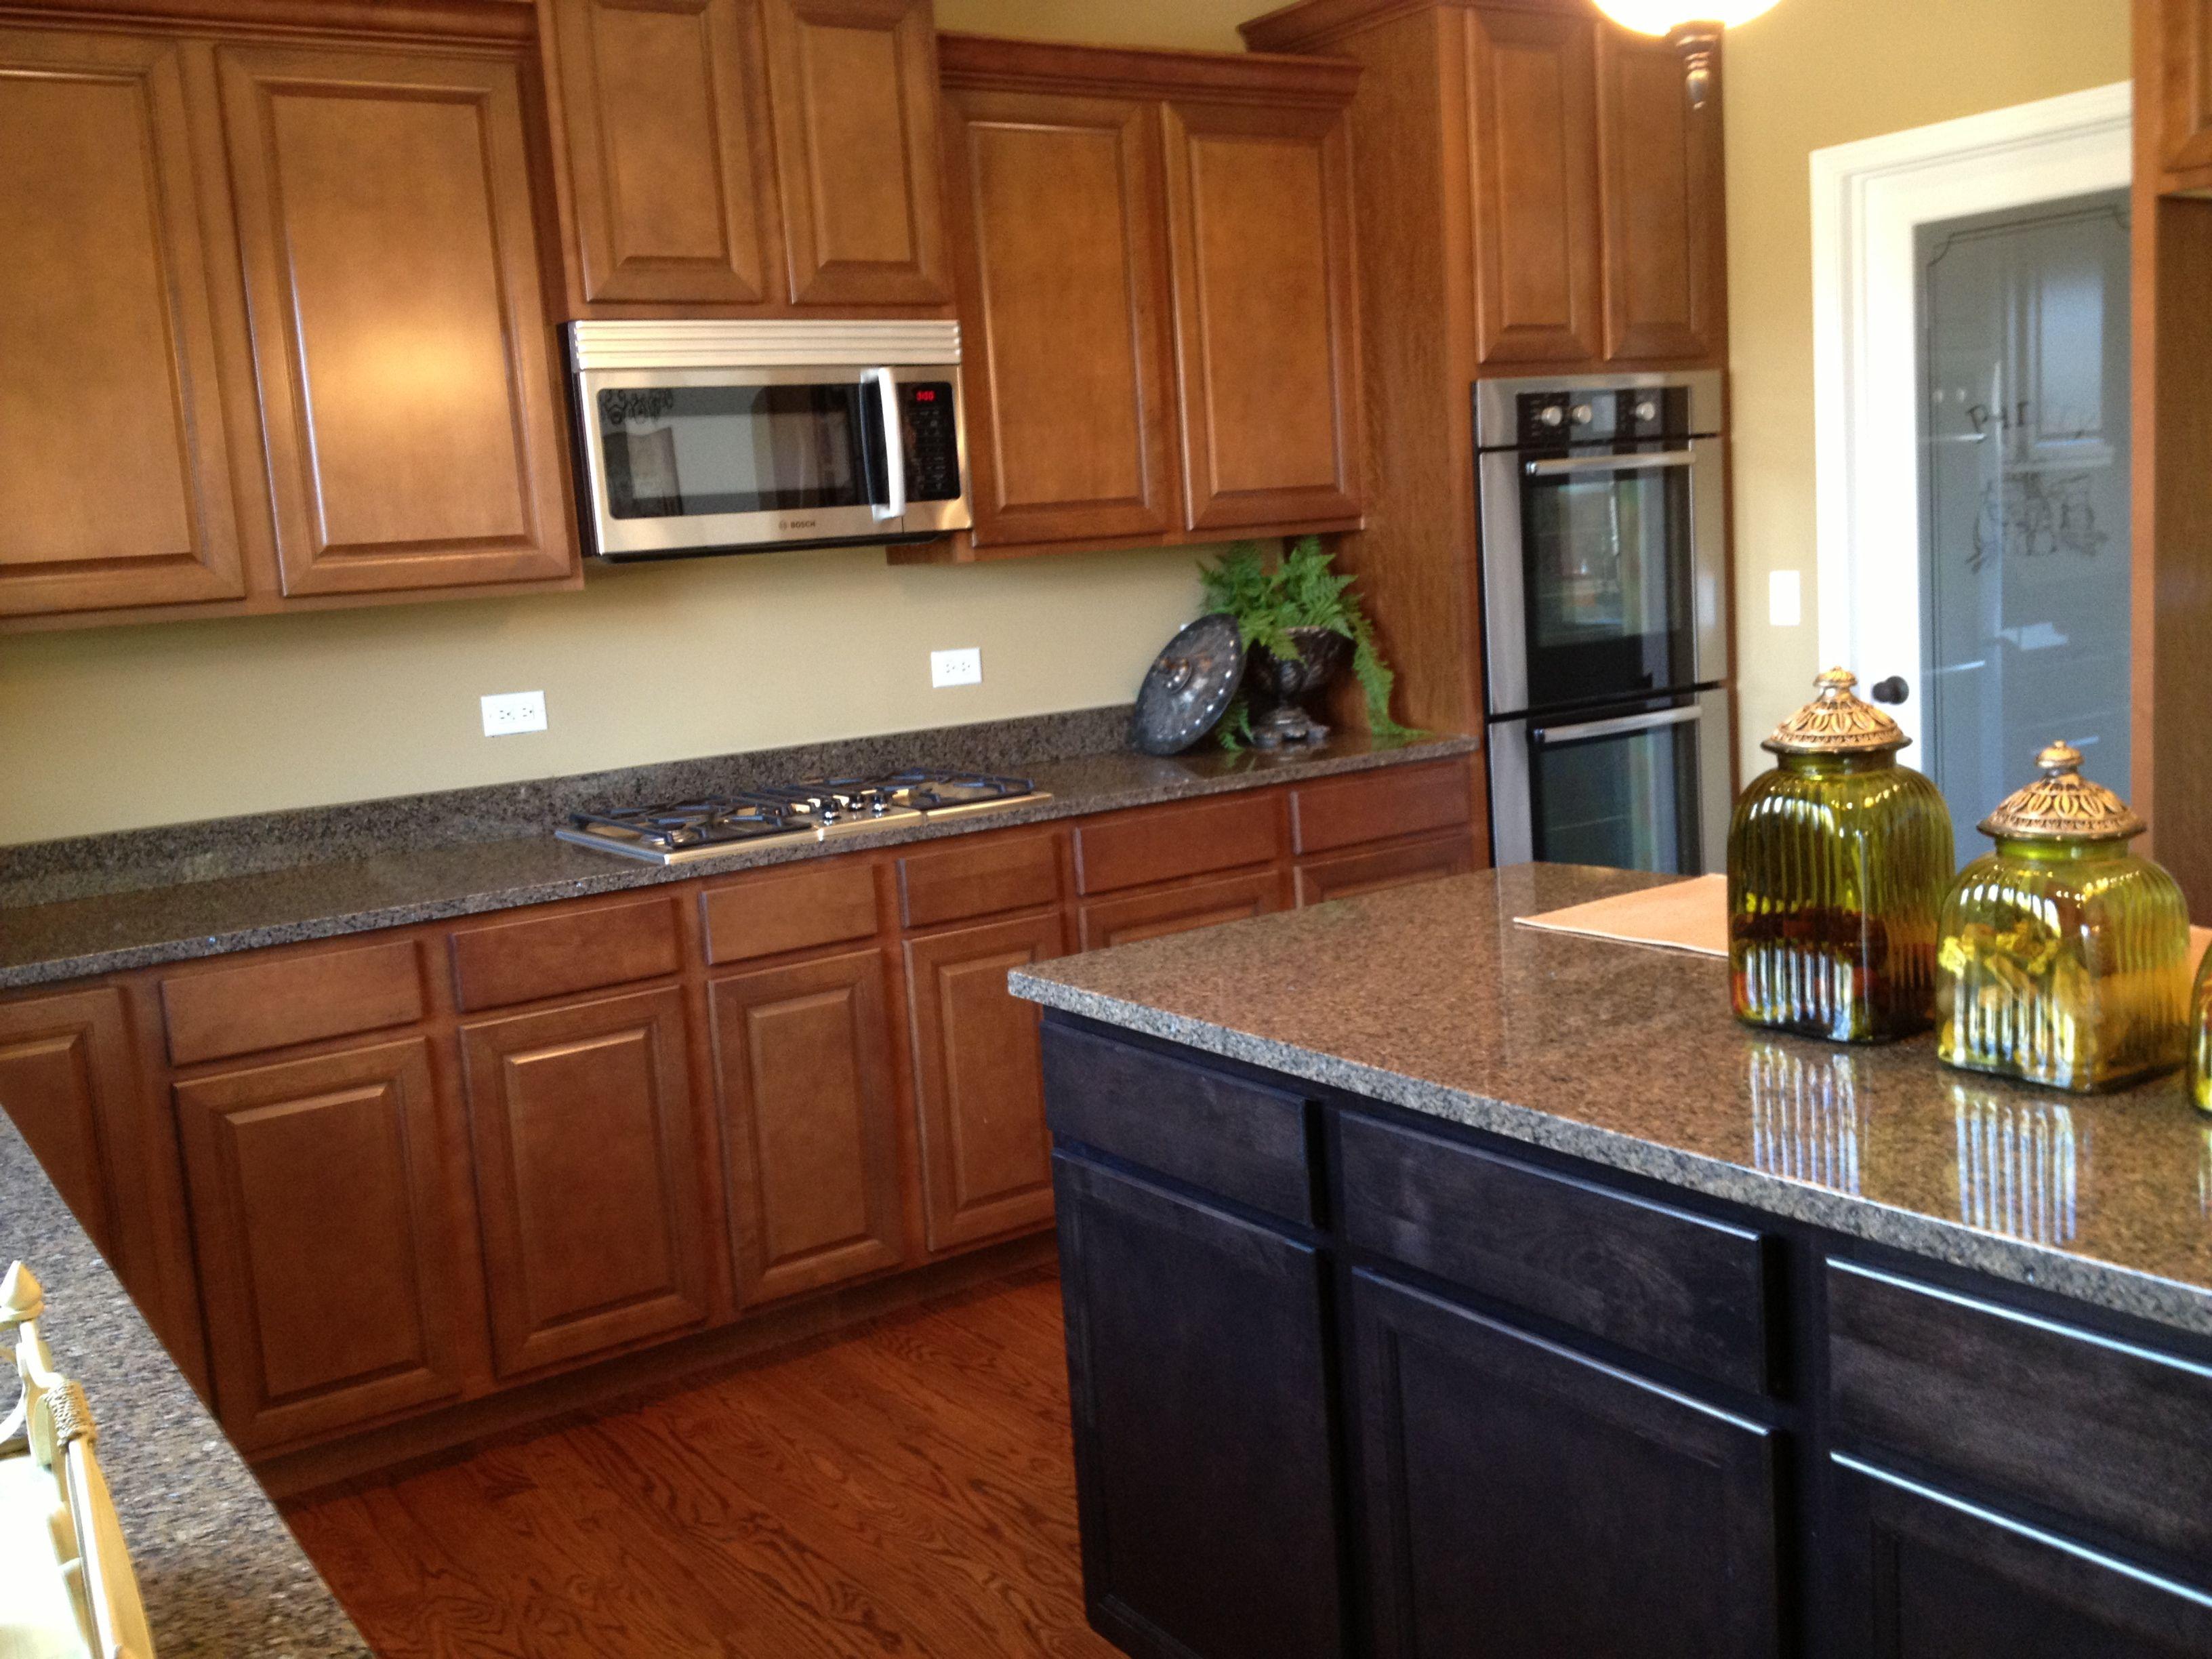 Add Sarsaparilla Cabinets To Your Island For Uniqueness In Your Kitchen Kitchen Design Kitchen Home